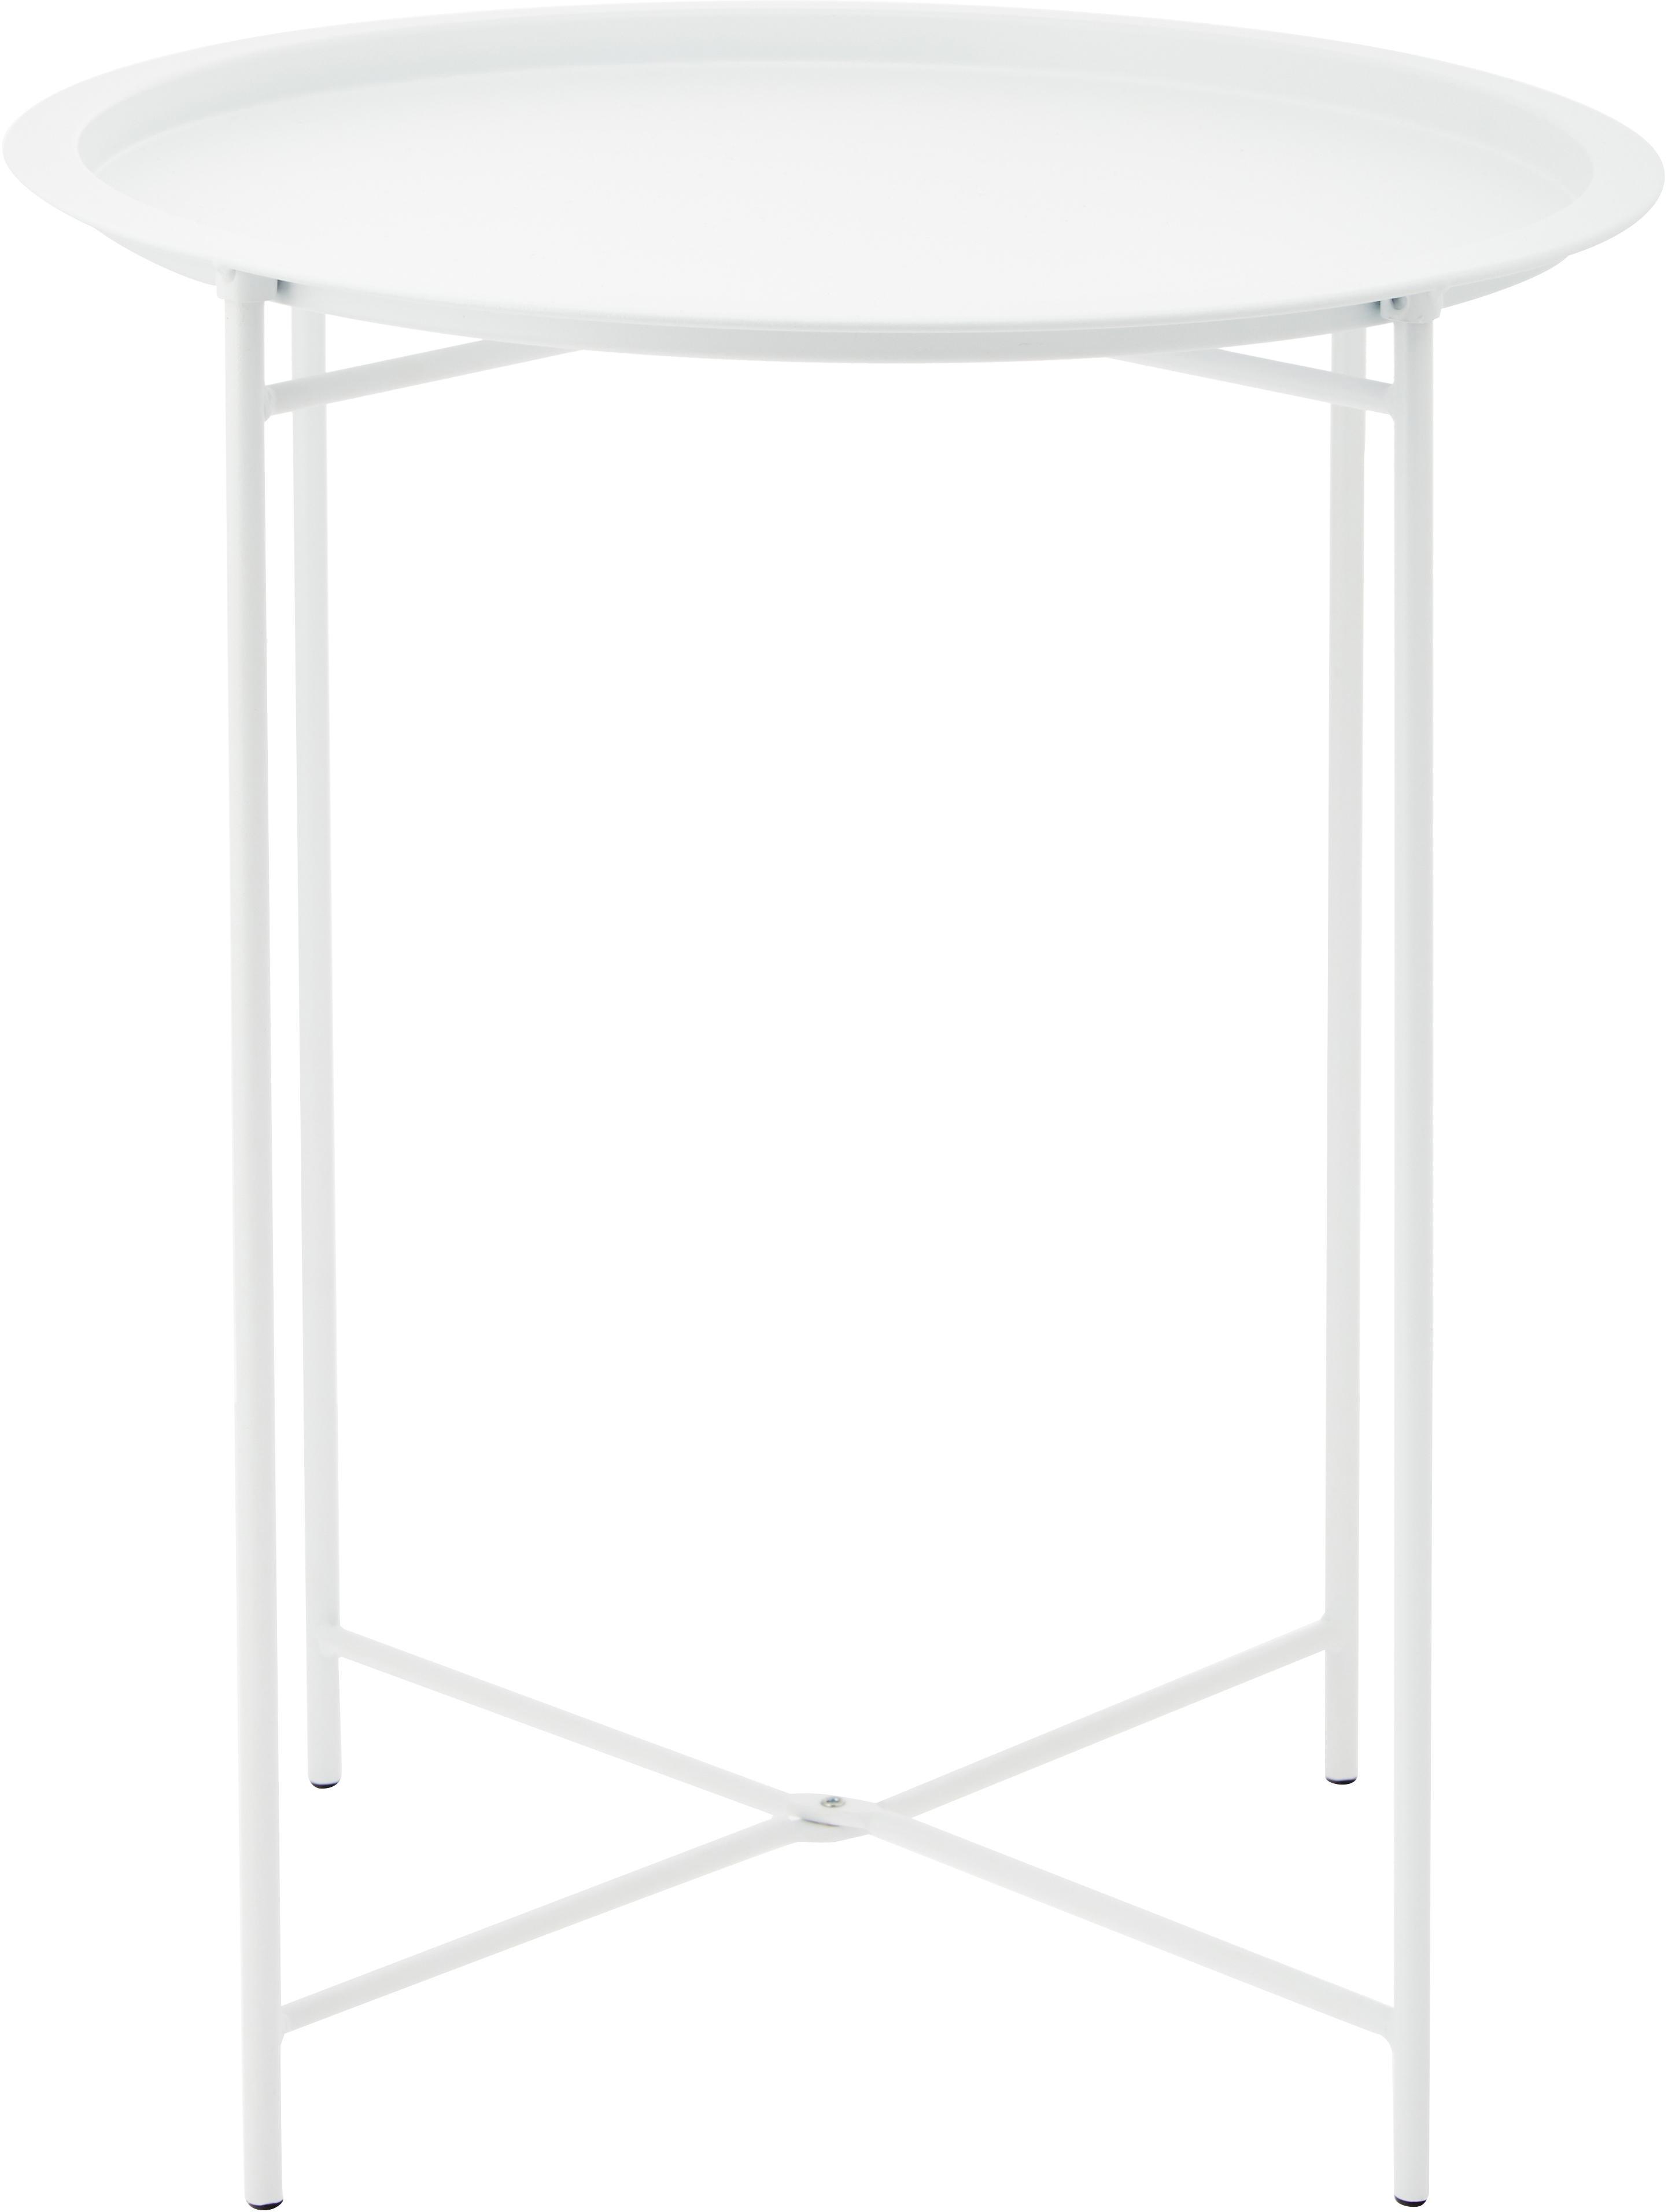 Tablett-Tisch Sangro aus Metall, Metall, pulverbeschichtet, Weiß, Ø 46 x H 52 cm